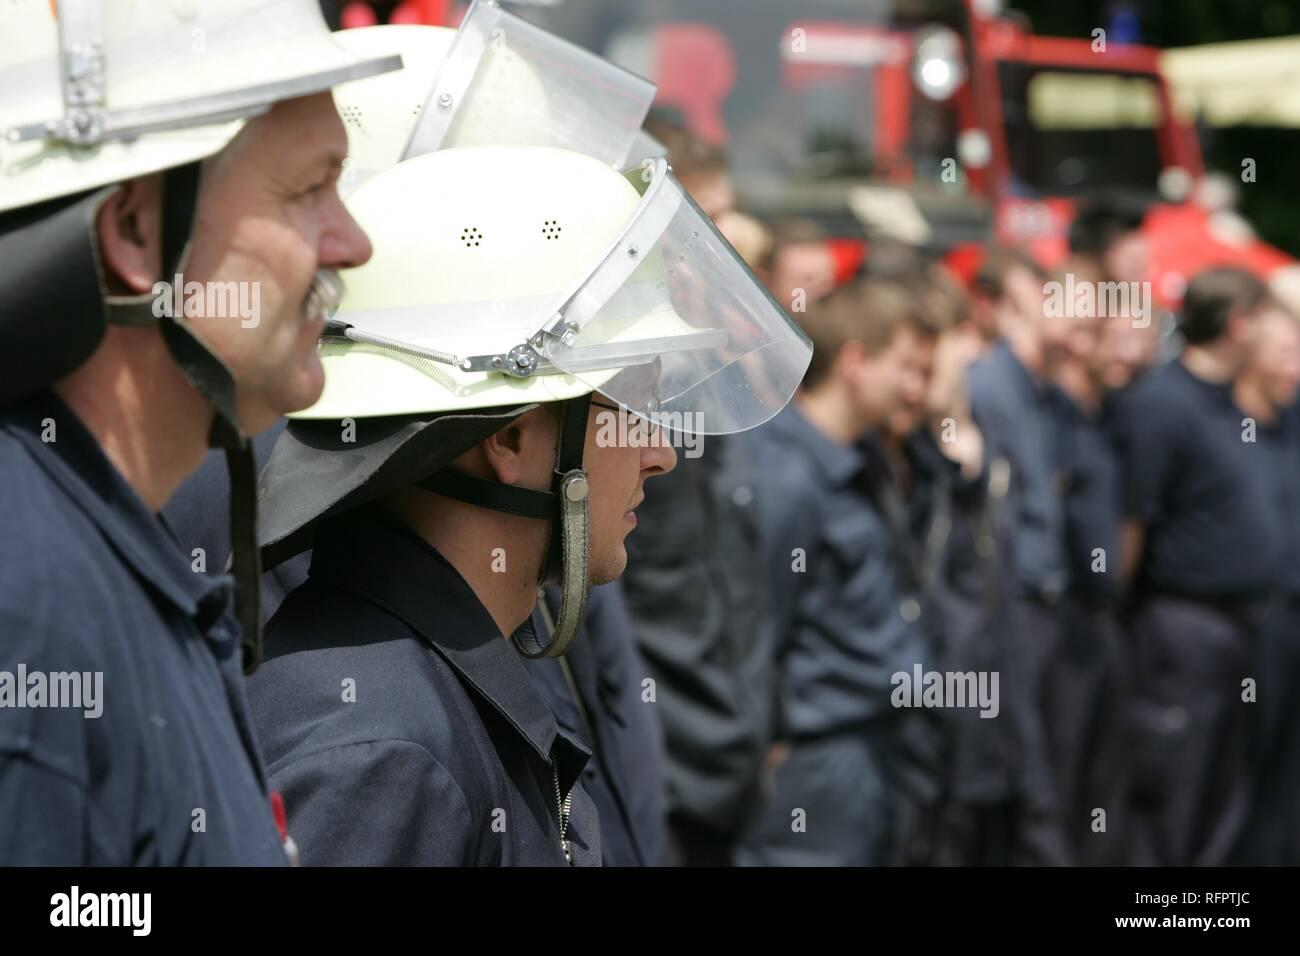 DEU, Federal Republic of Germany, Essen: Public day, oen door at a volounteer fire brigade. - Stock Image